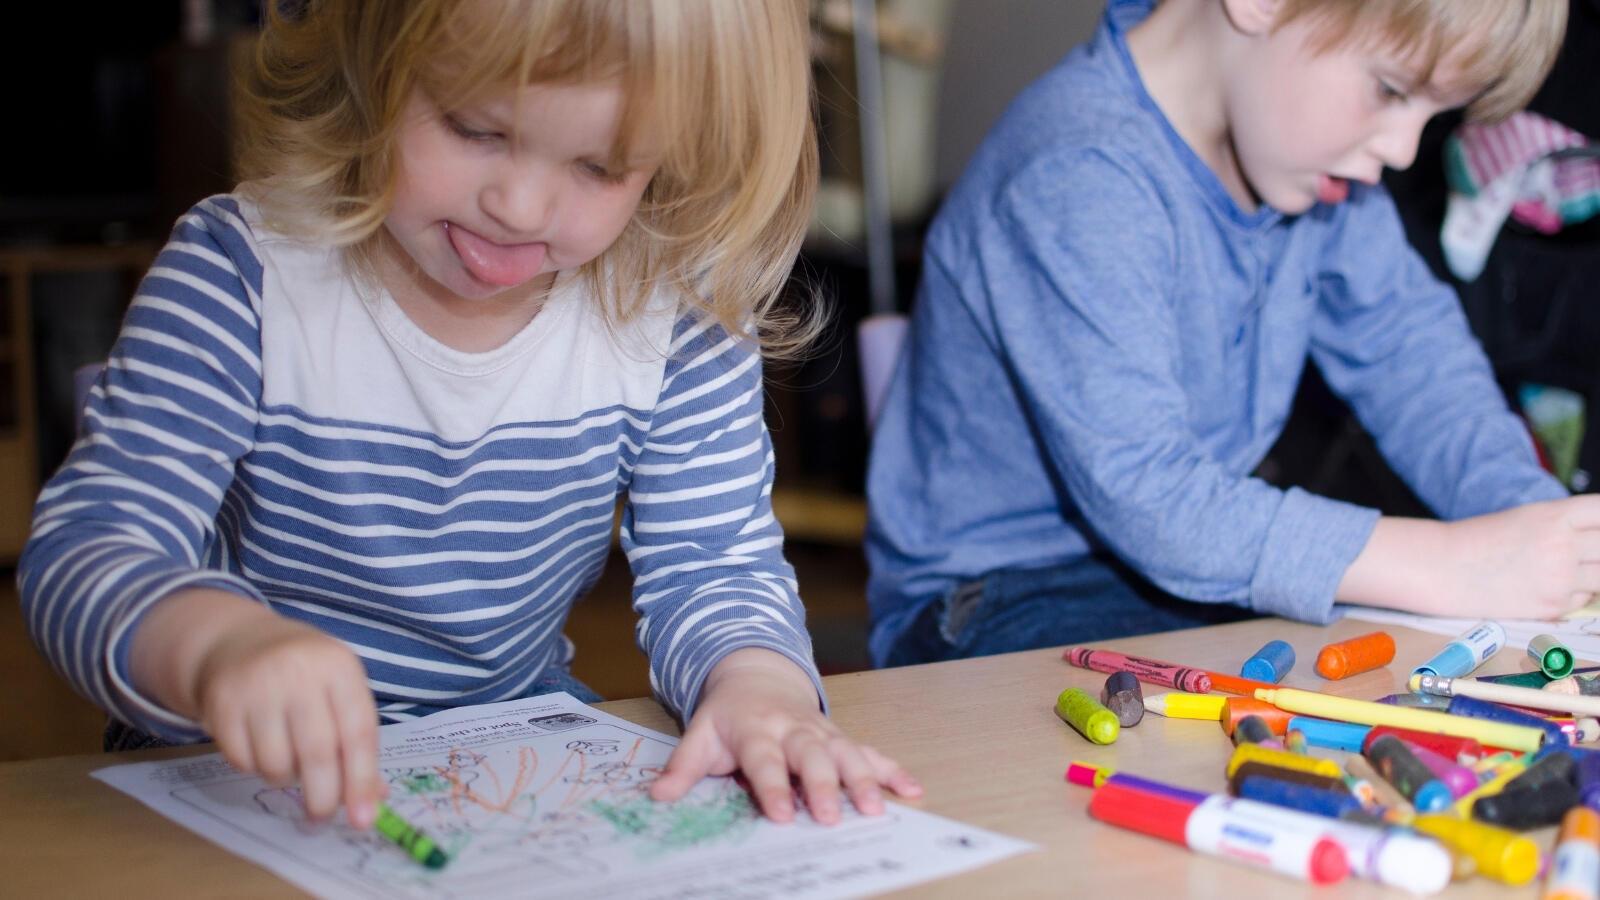 trick to teach child new skills